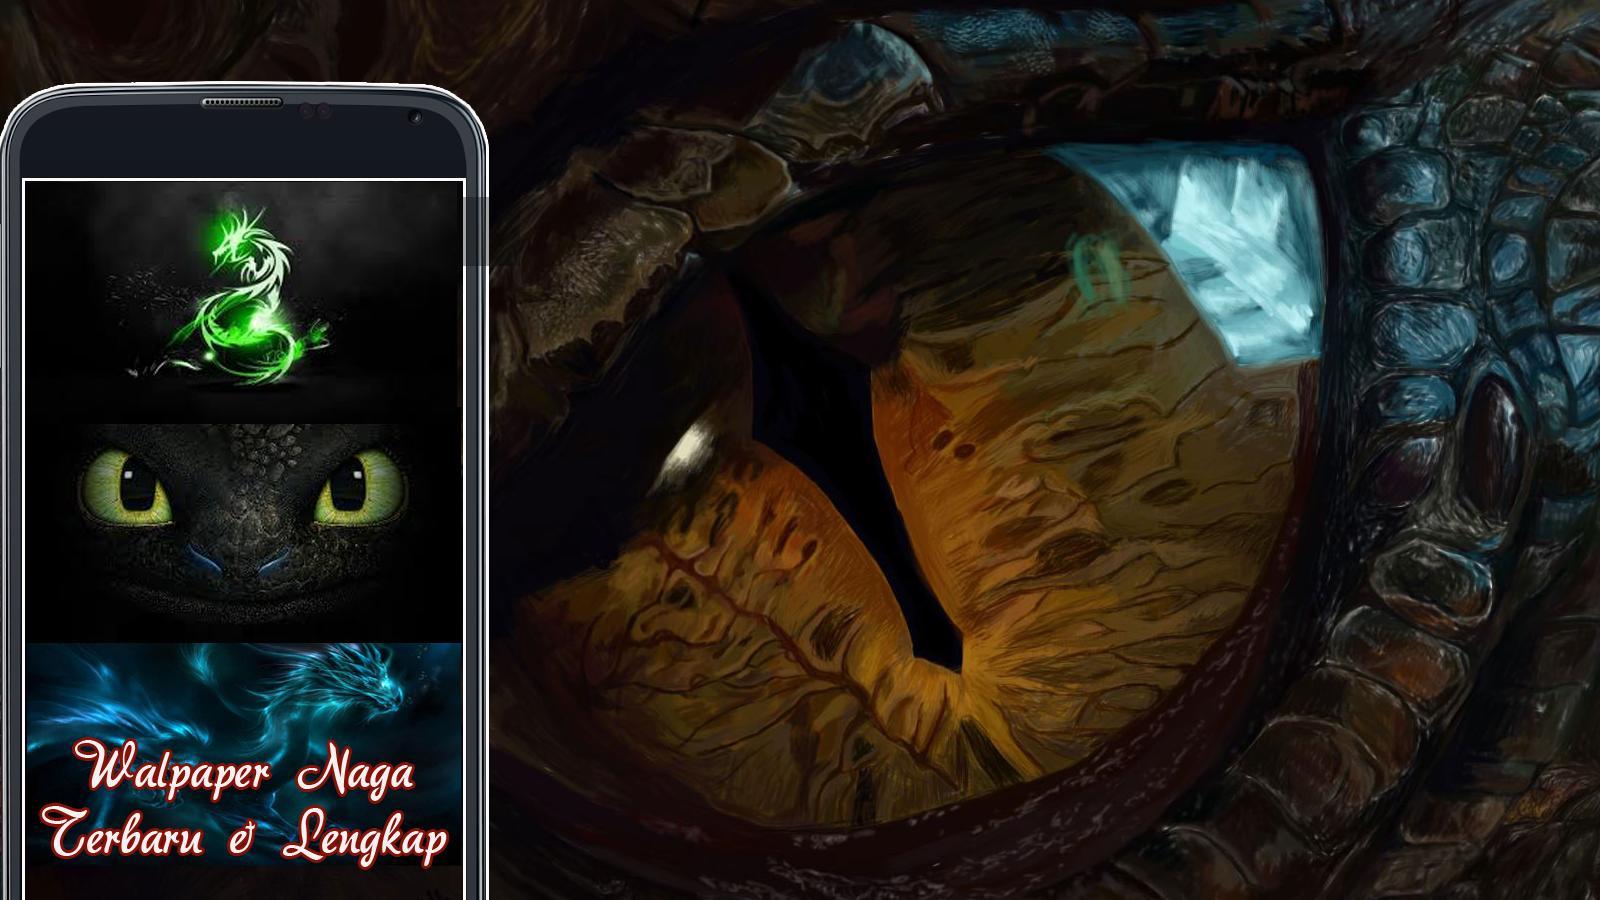 Wallpaper Ular Naga For Android Apk Download